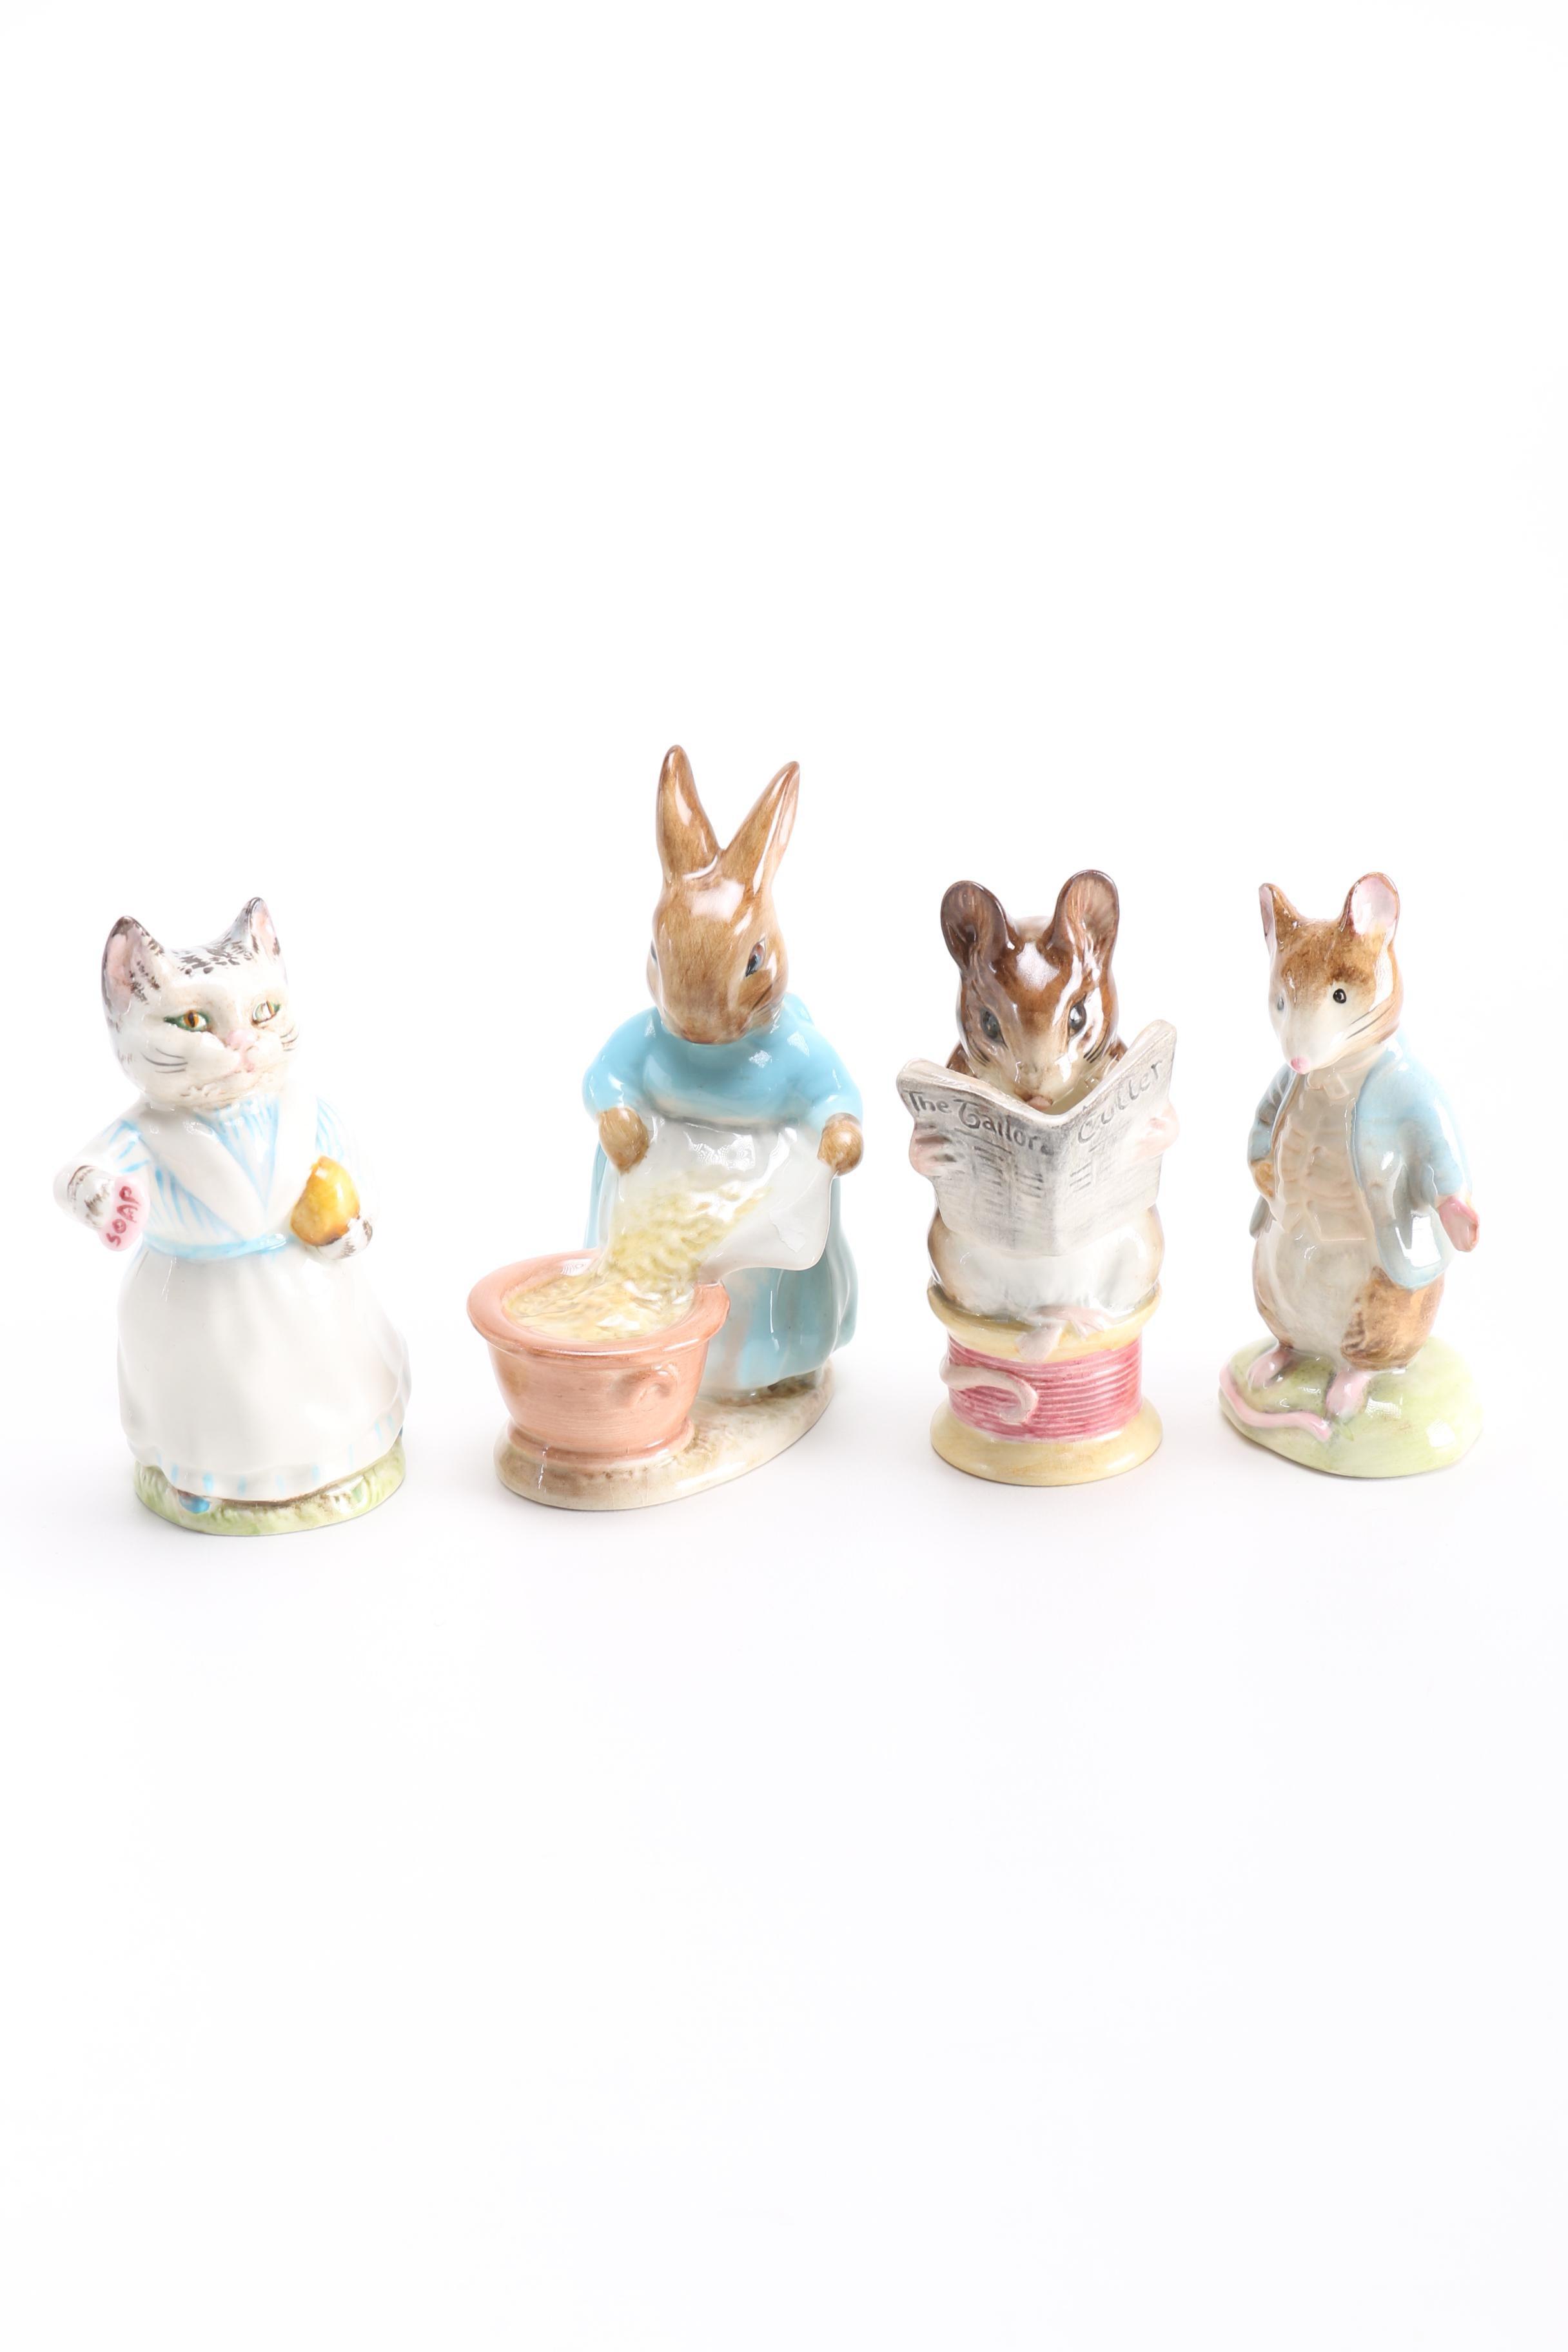 "Beswick Beatrix Potter Figurines Featuring ""The Tailor of Gloucester"""